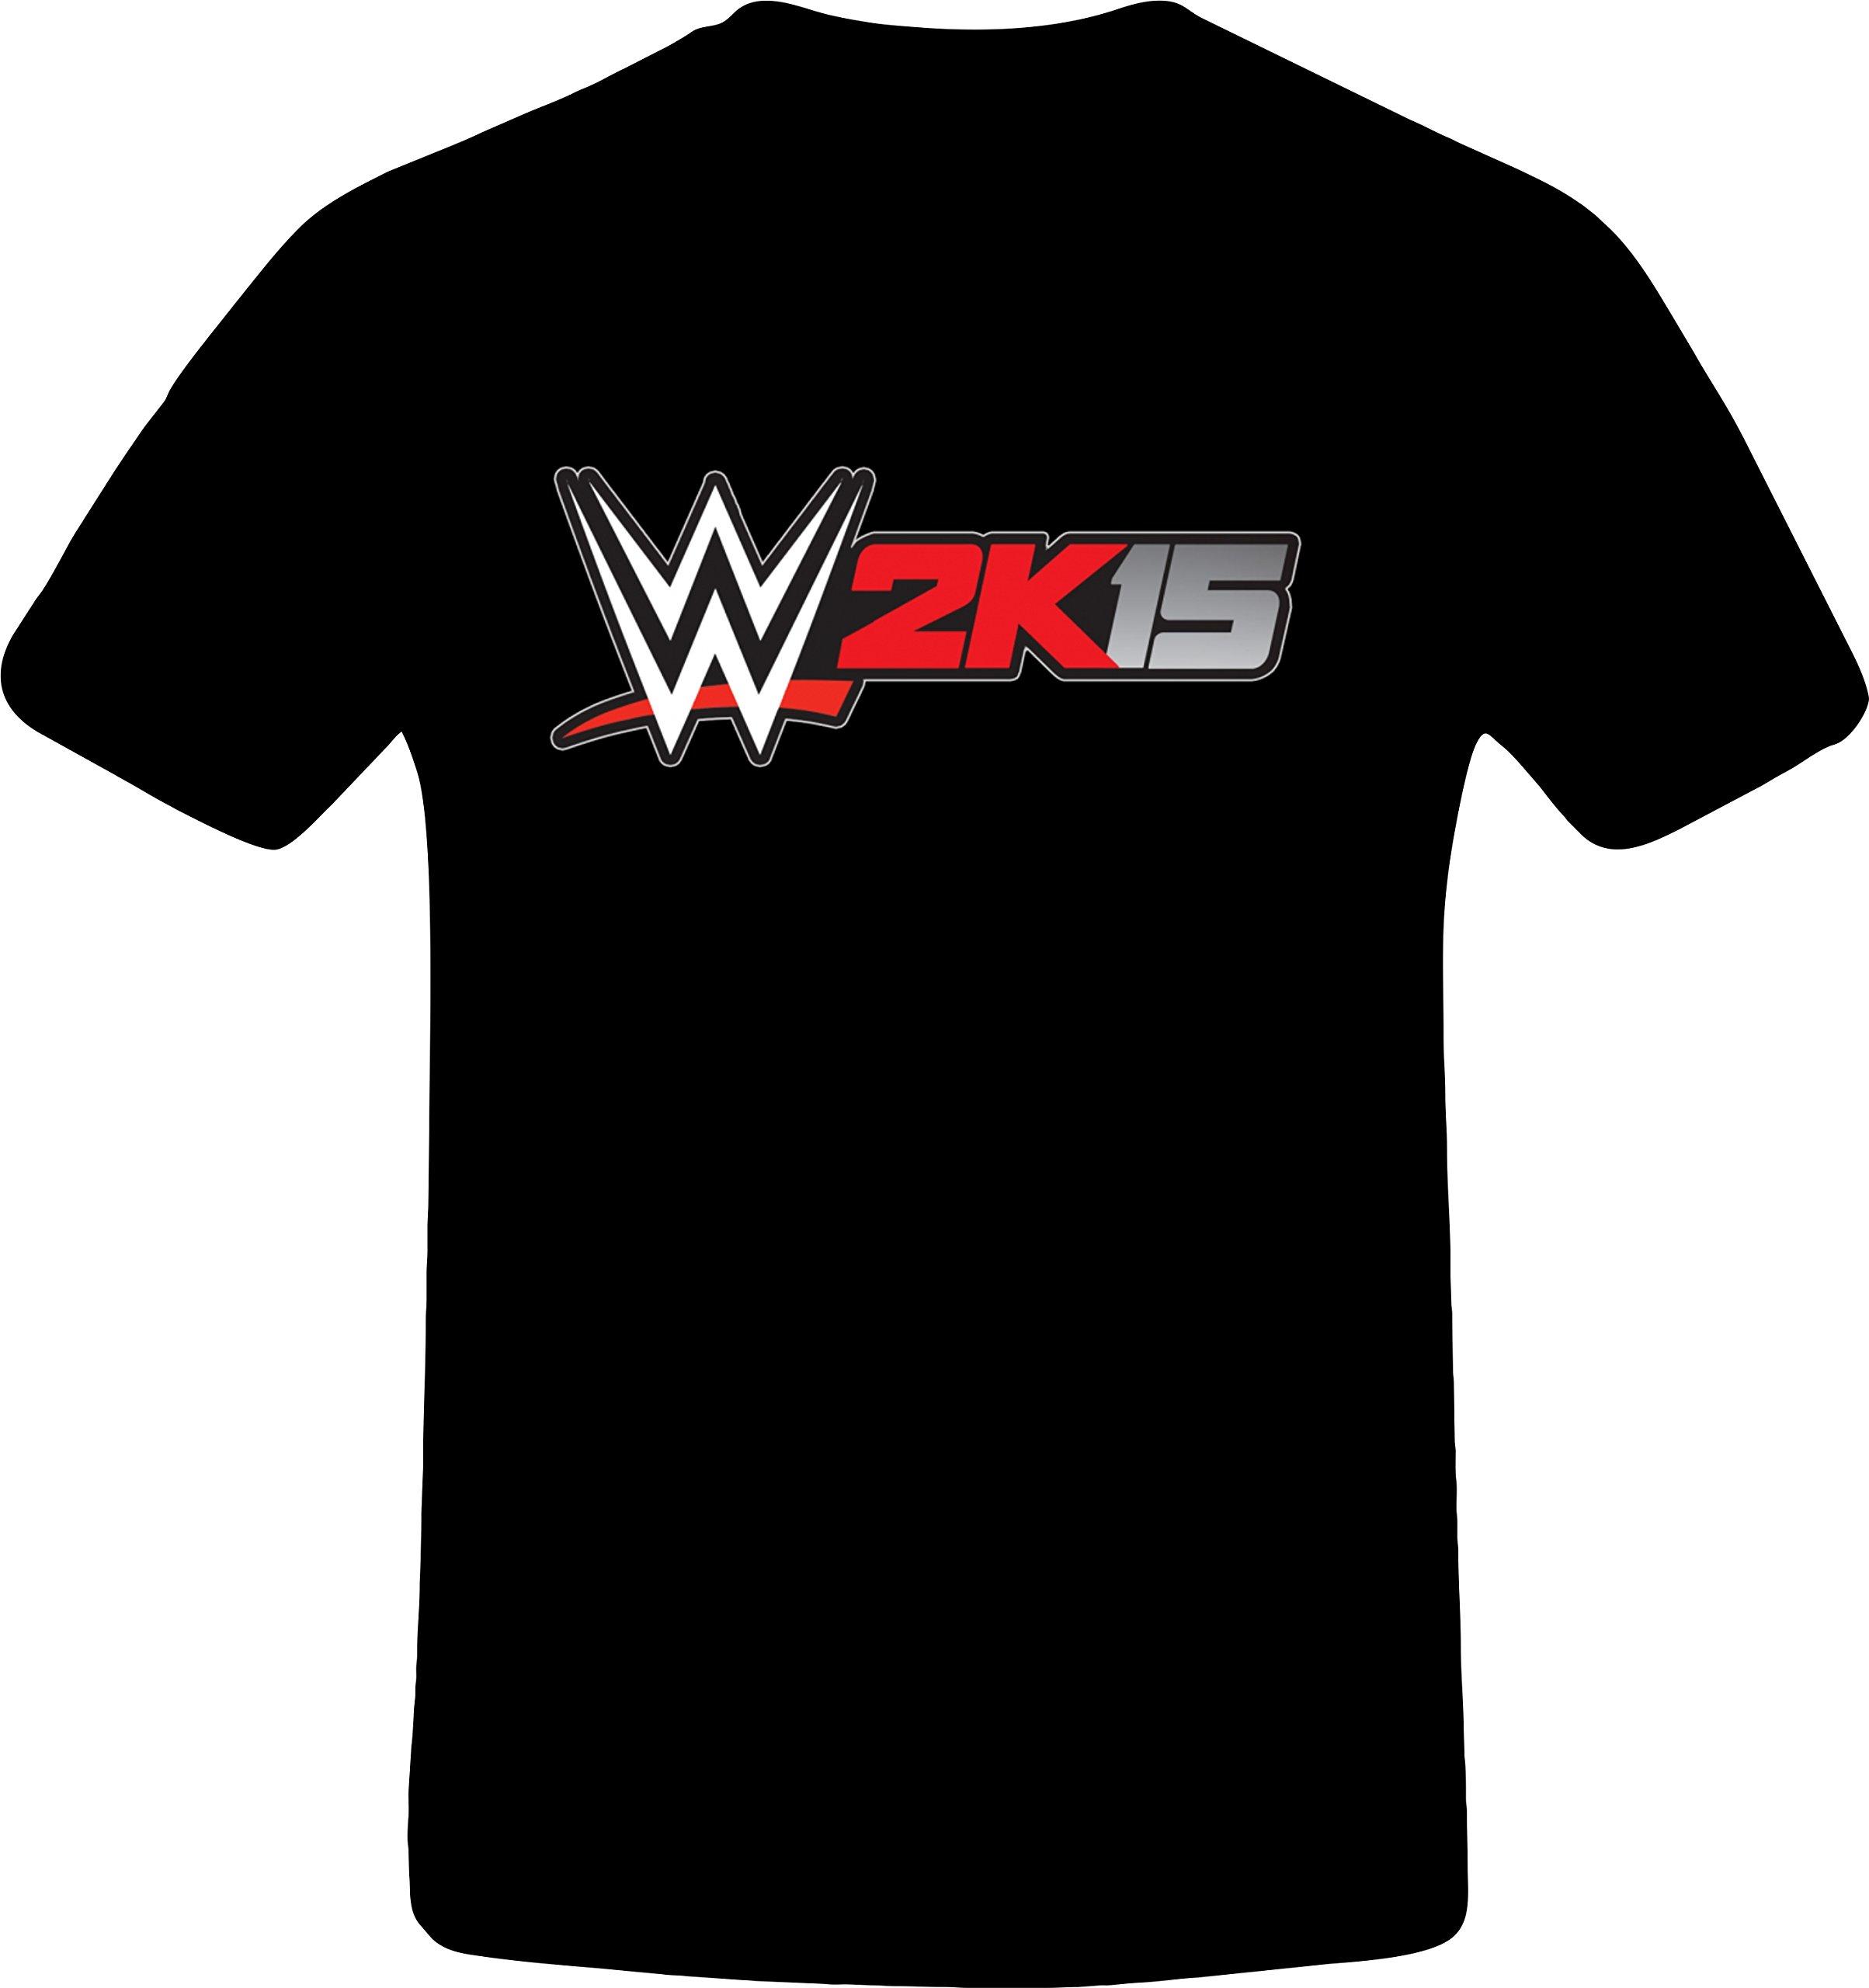 W 2k15 Wrestling - Best Quality Costum Tshirt (5XL, BLACK)